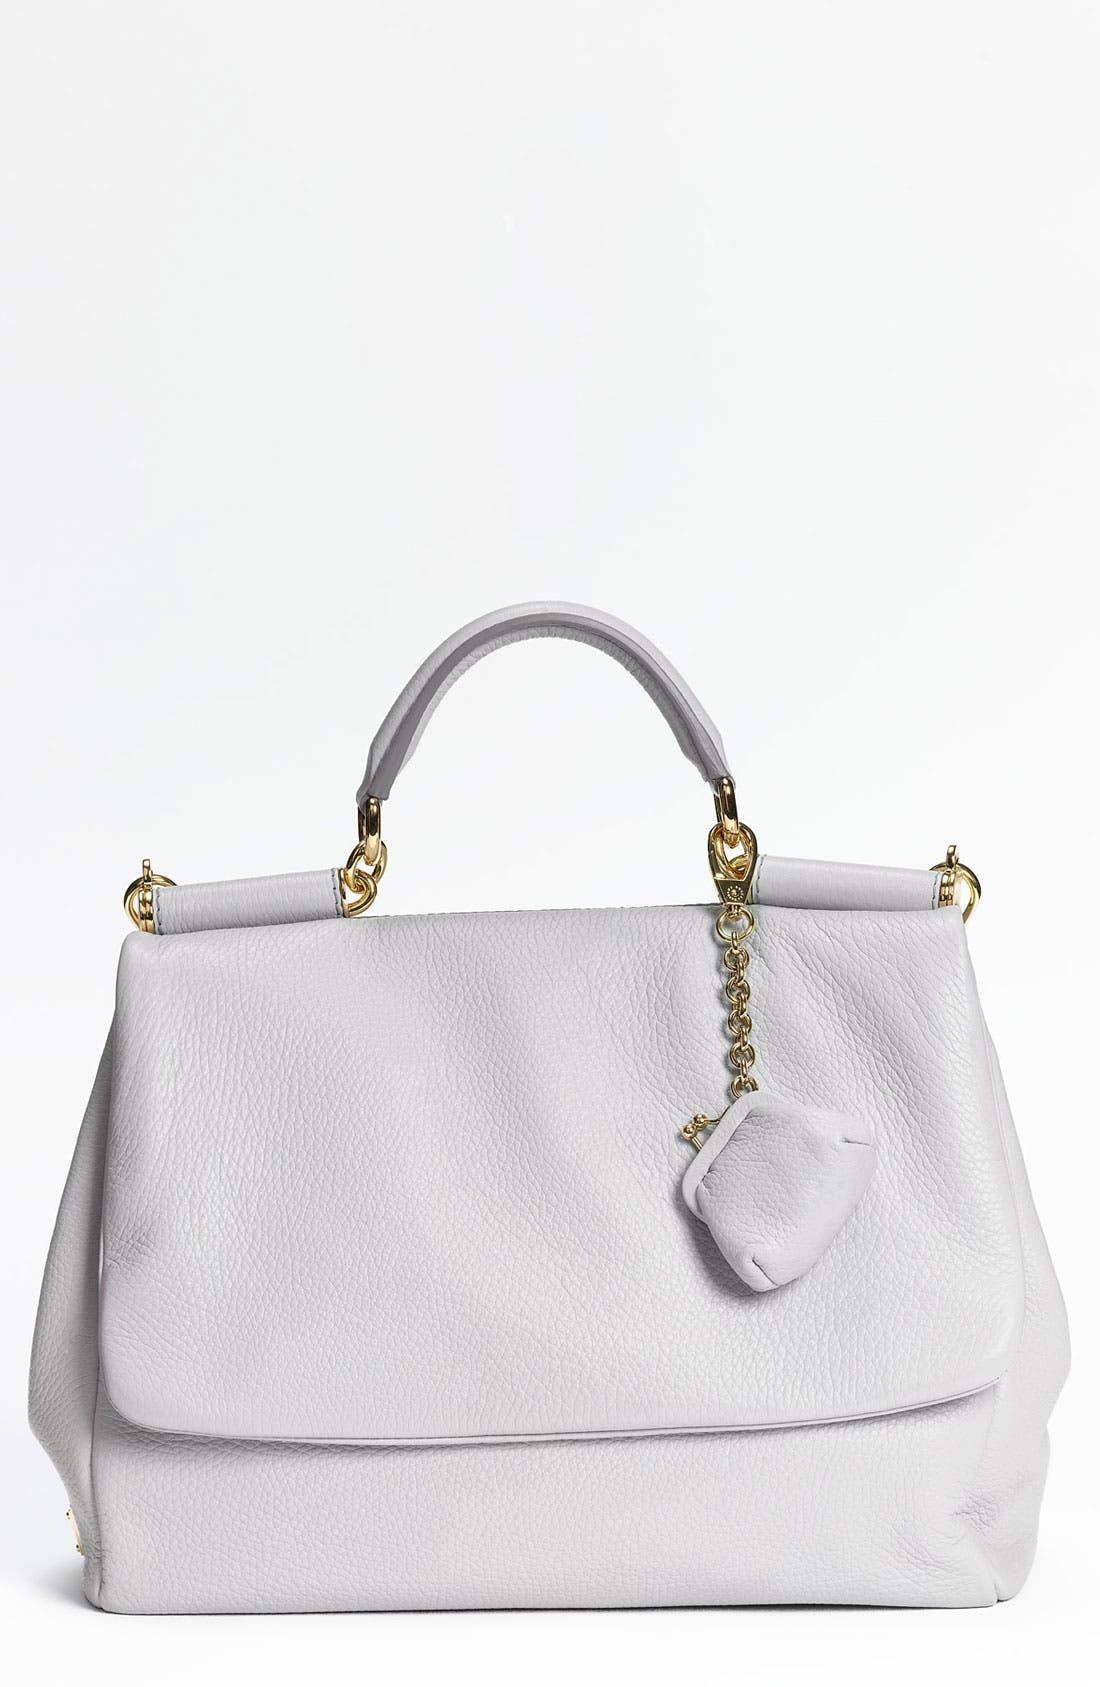 Alternate Image 1 Selected - Dolce&Gabbana 'Miss Sicily Soft' Leather Satchel